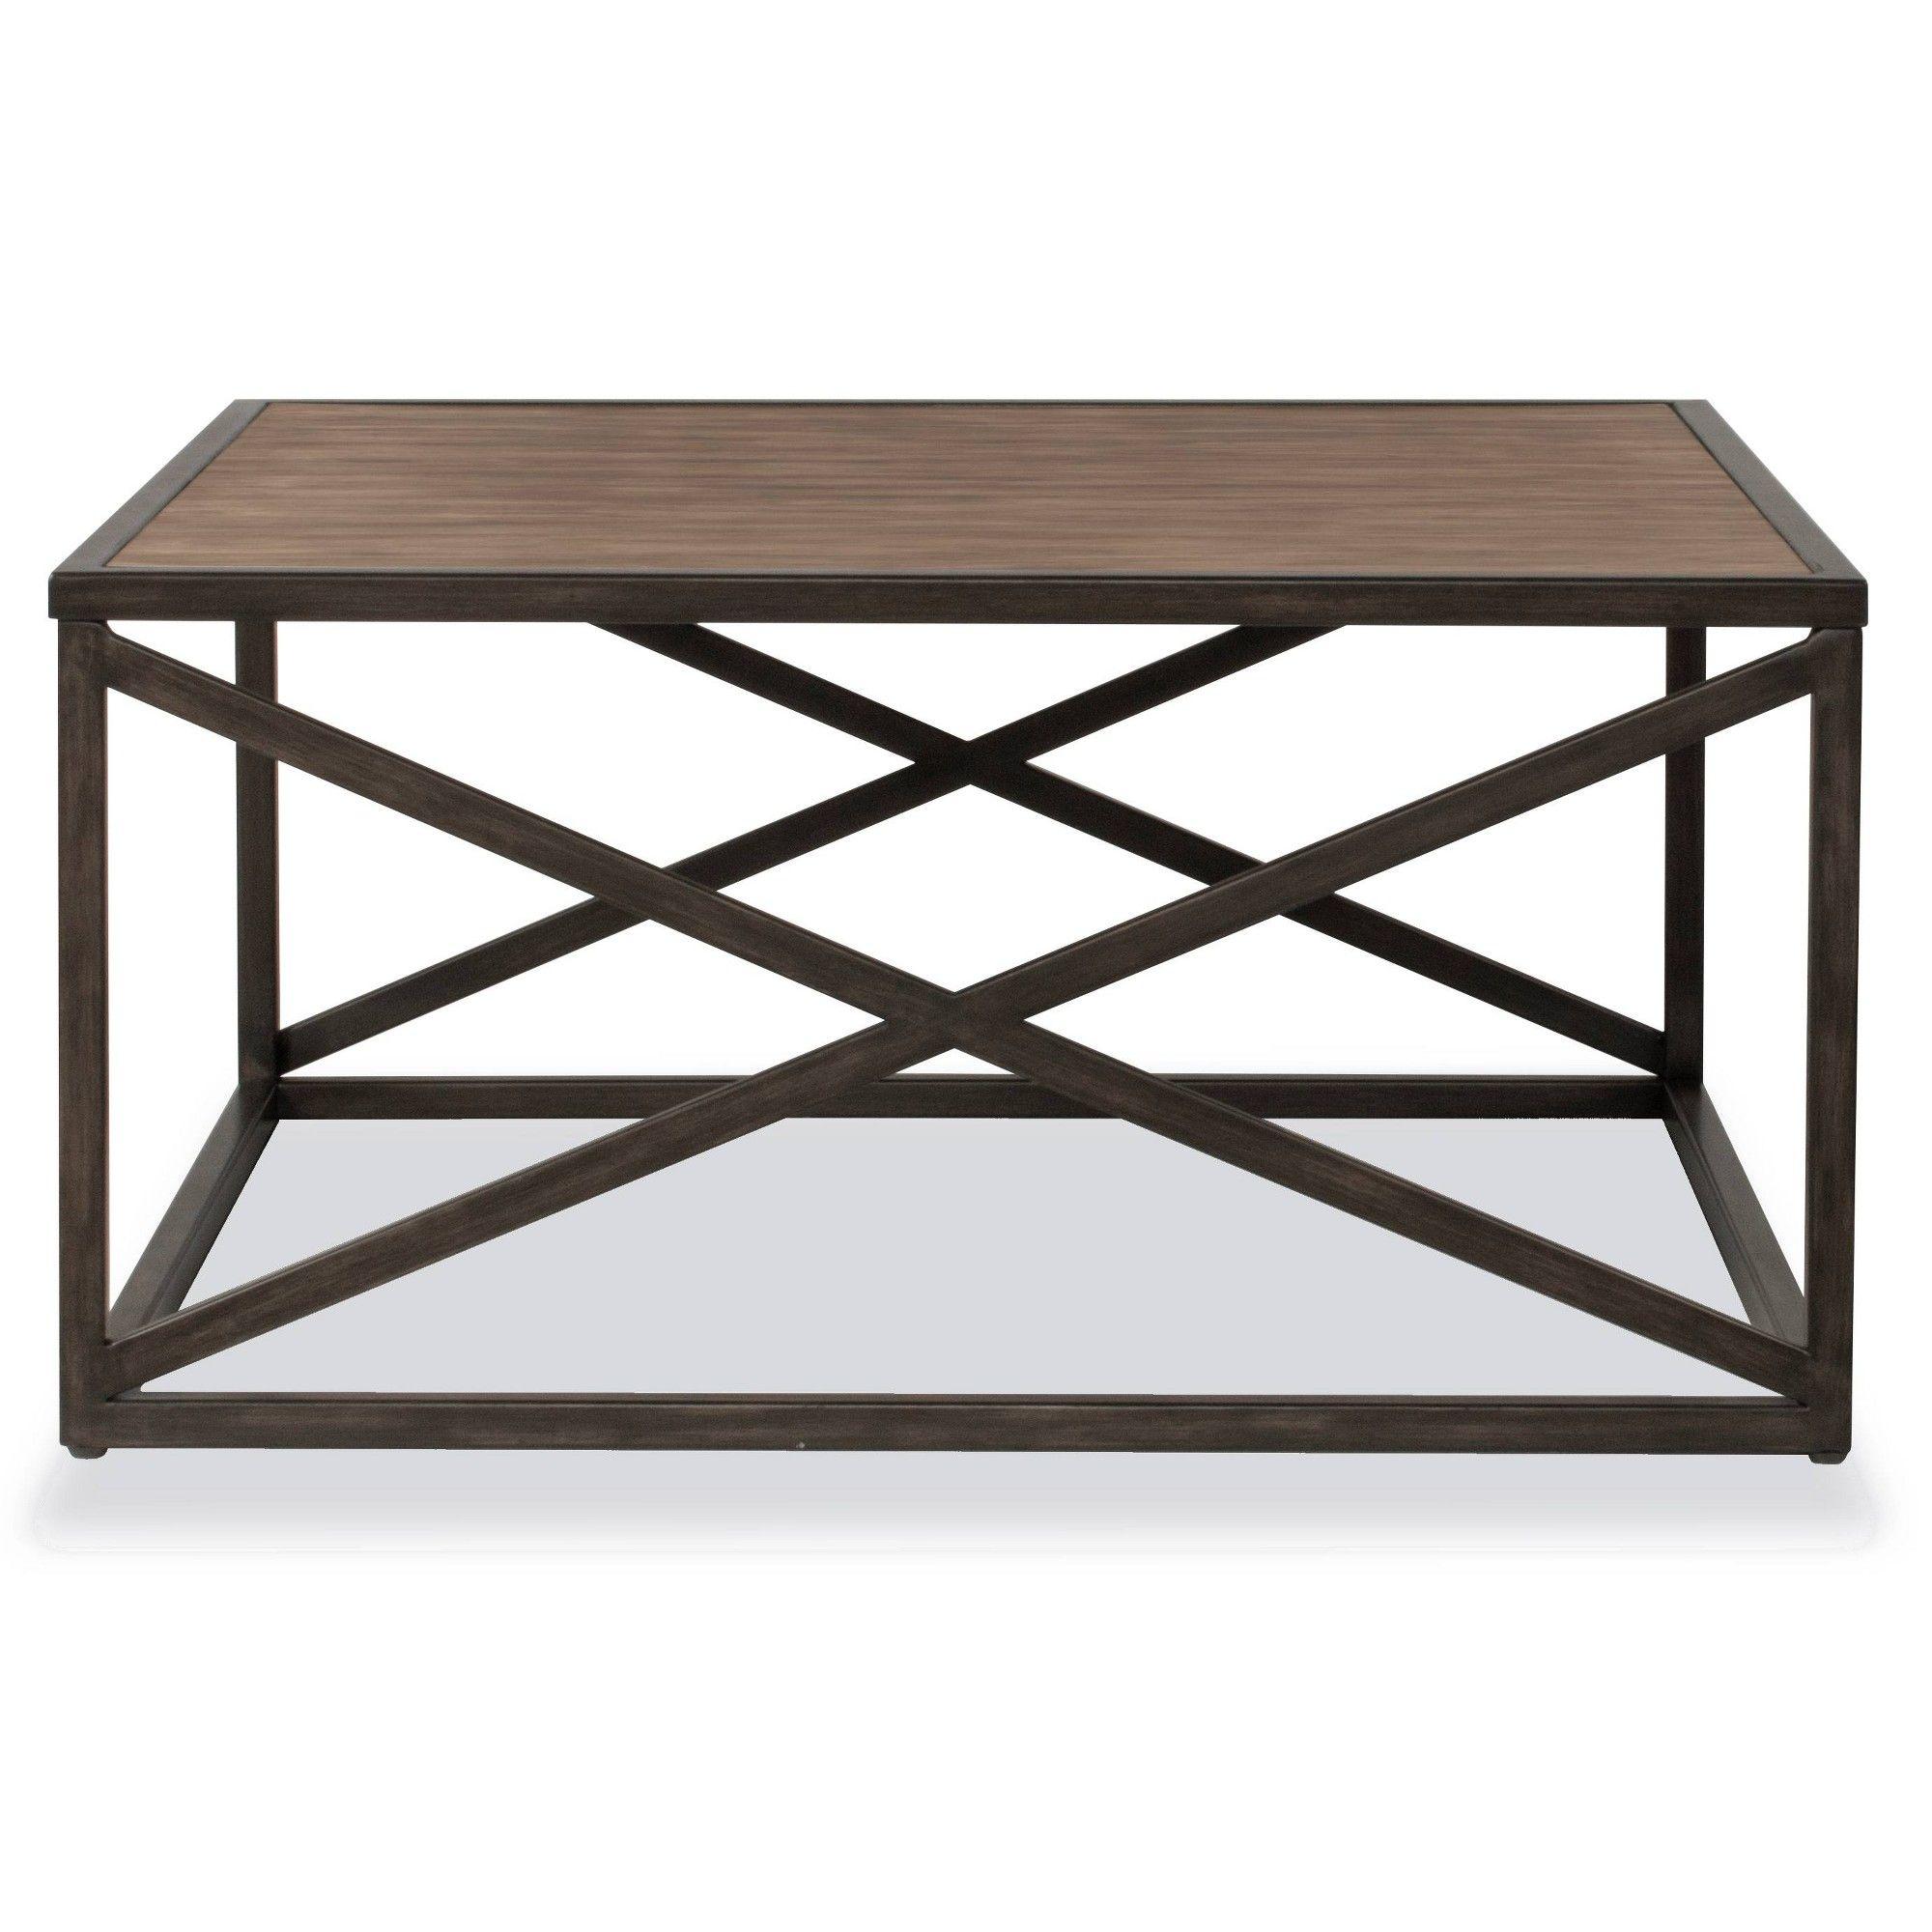 Angora Coffee Table Light Brown Hillsdale Furniture Hillsdale Furniture Coffee Table Rectangular Coffee Table [ 2000 x 2000 Pixel ]